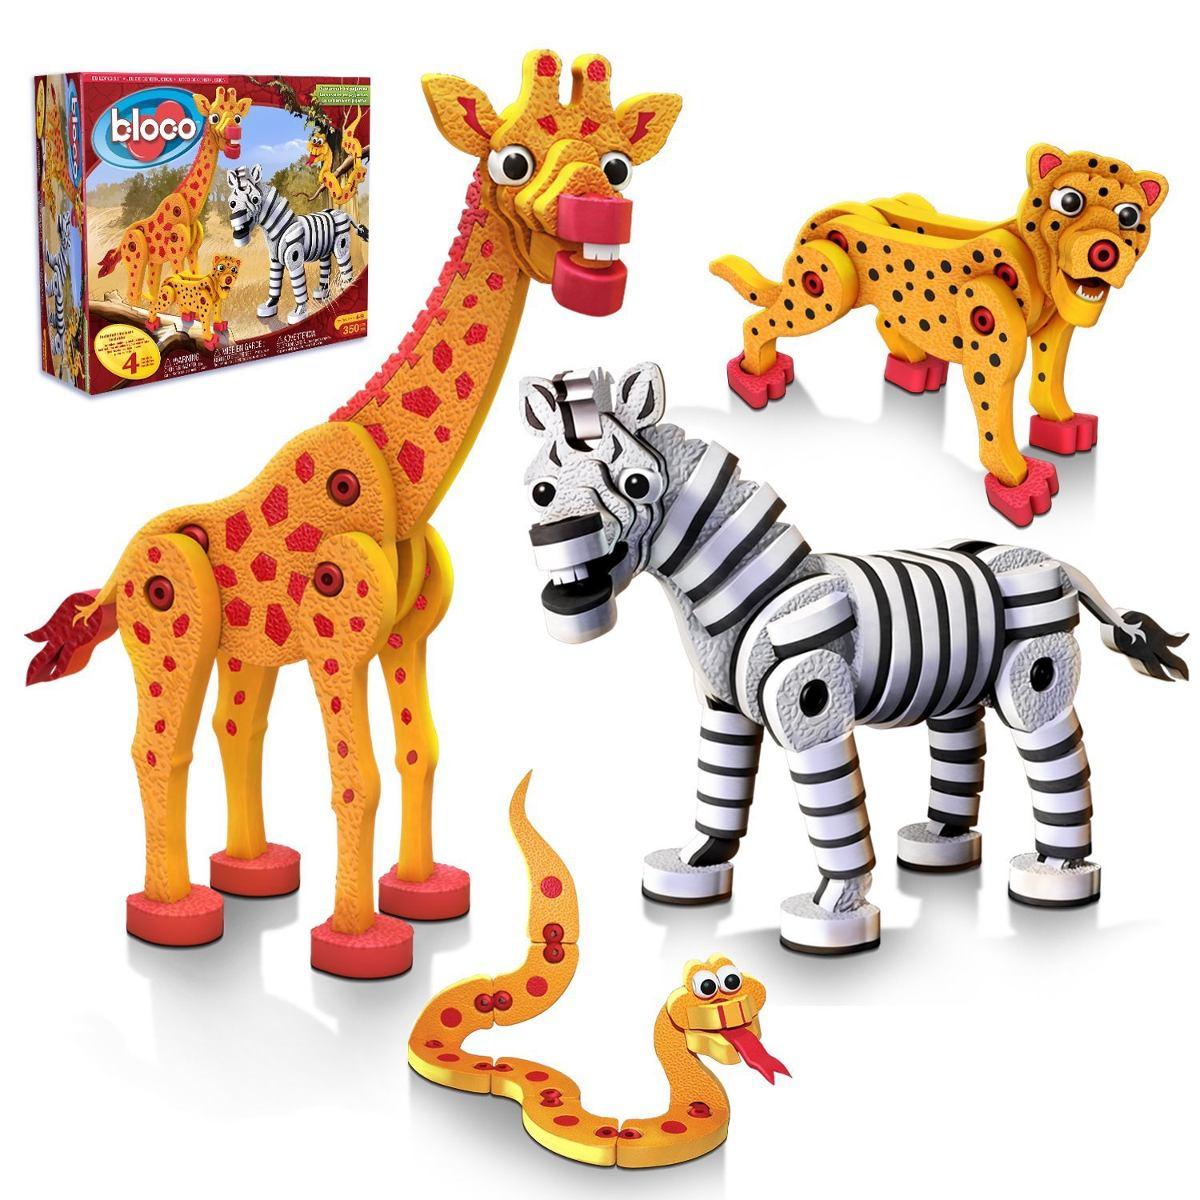 animales sabana armables juguetes para nios foamy bloco